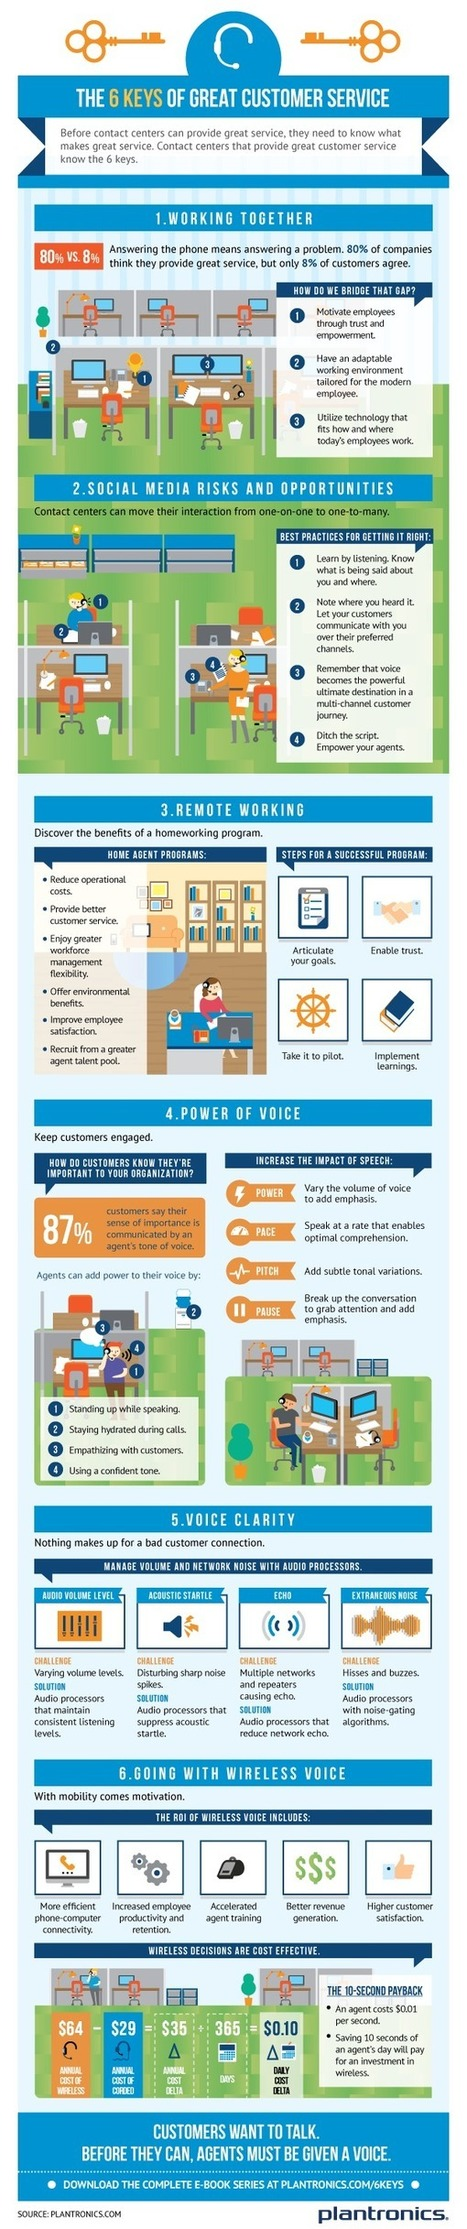 The 6 Keys of Great Customer Service | Business 2 Community | IT- BIAS Corporation | Scoop.it